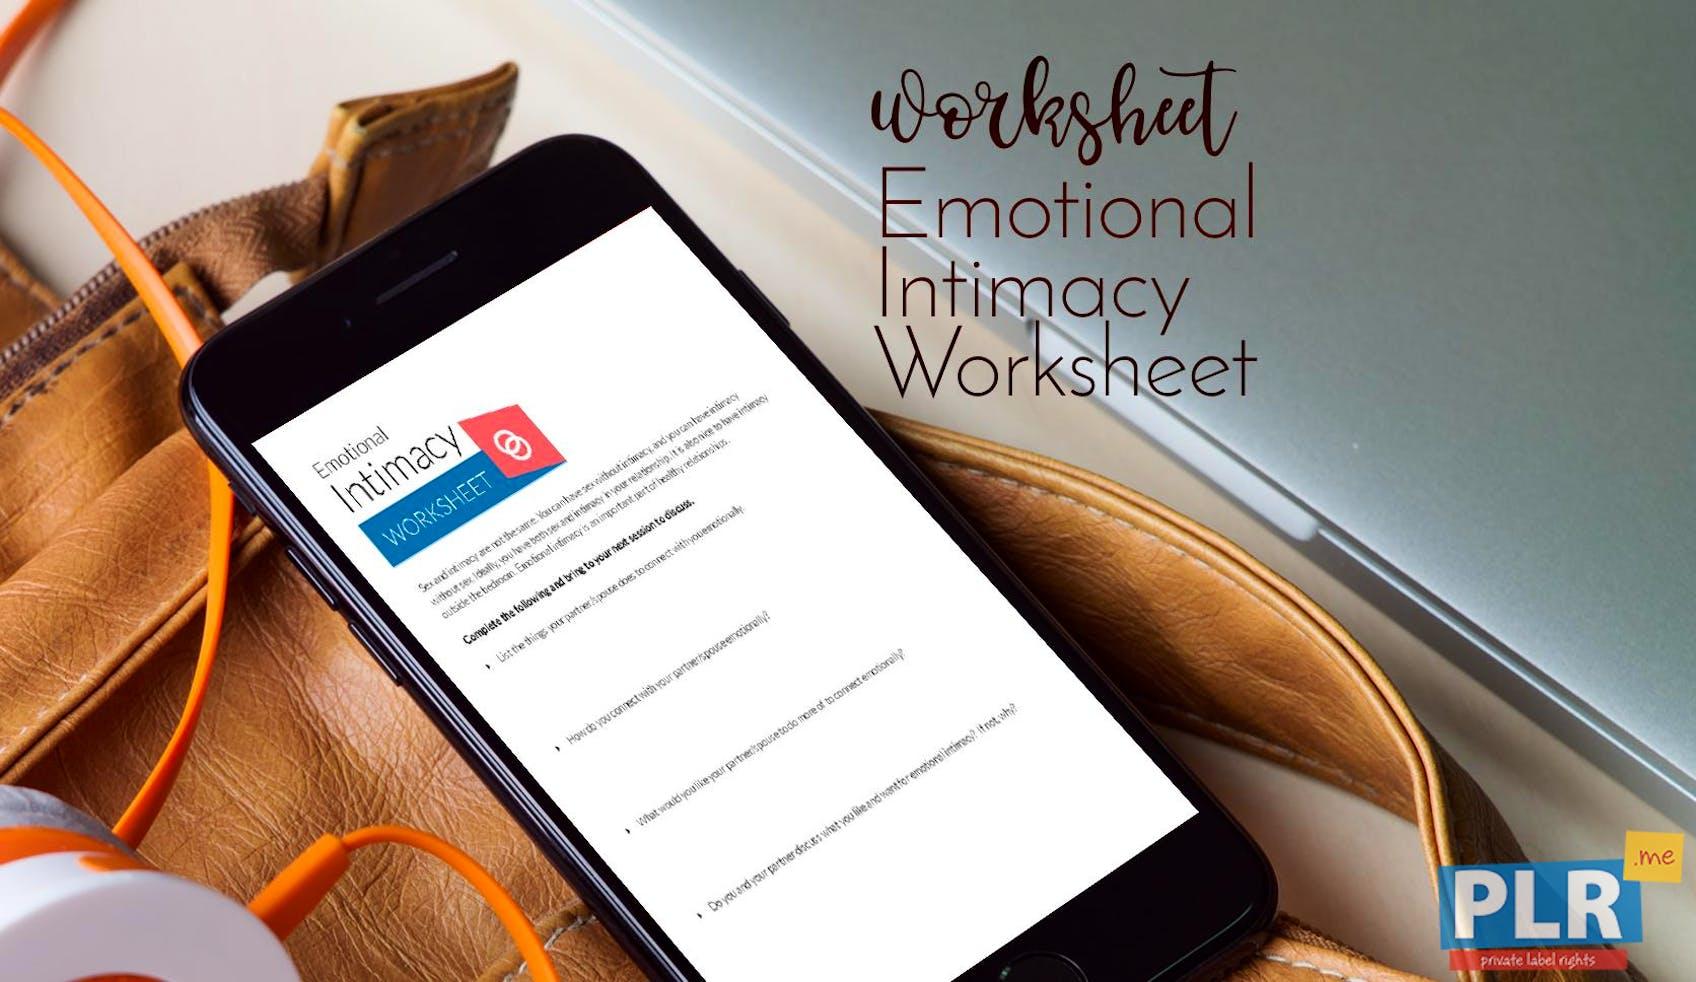 Emotional Intimacy Worksheet